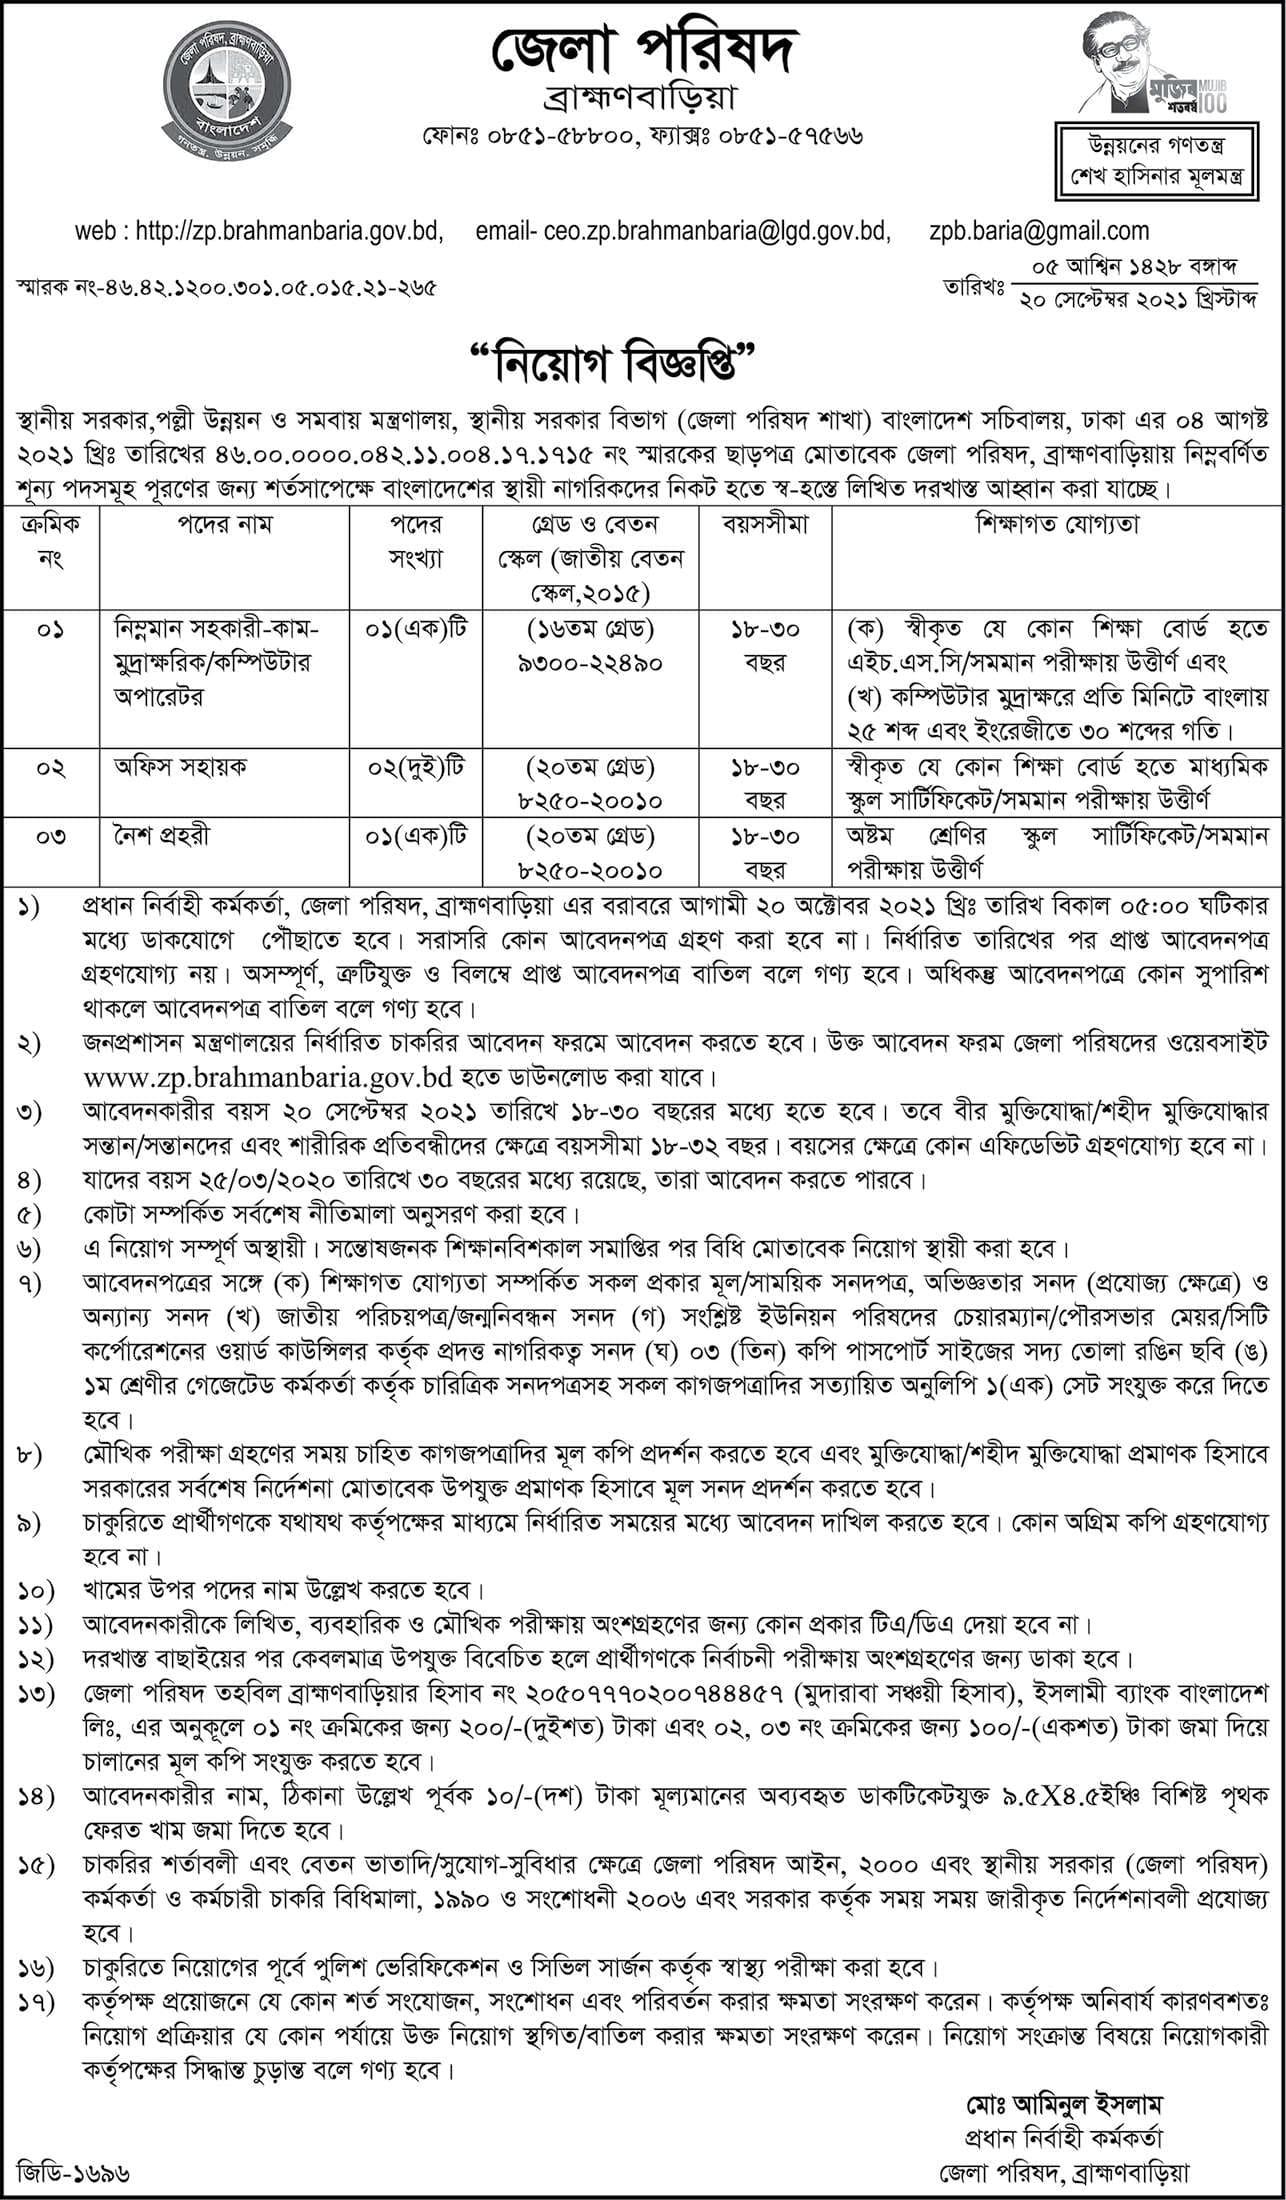 Brahmanbaria Zila Parishad job circular 2021